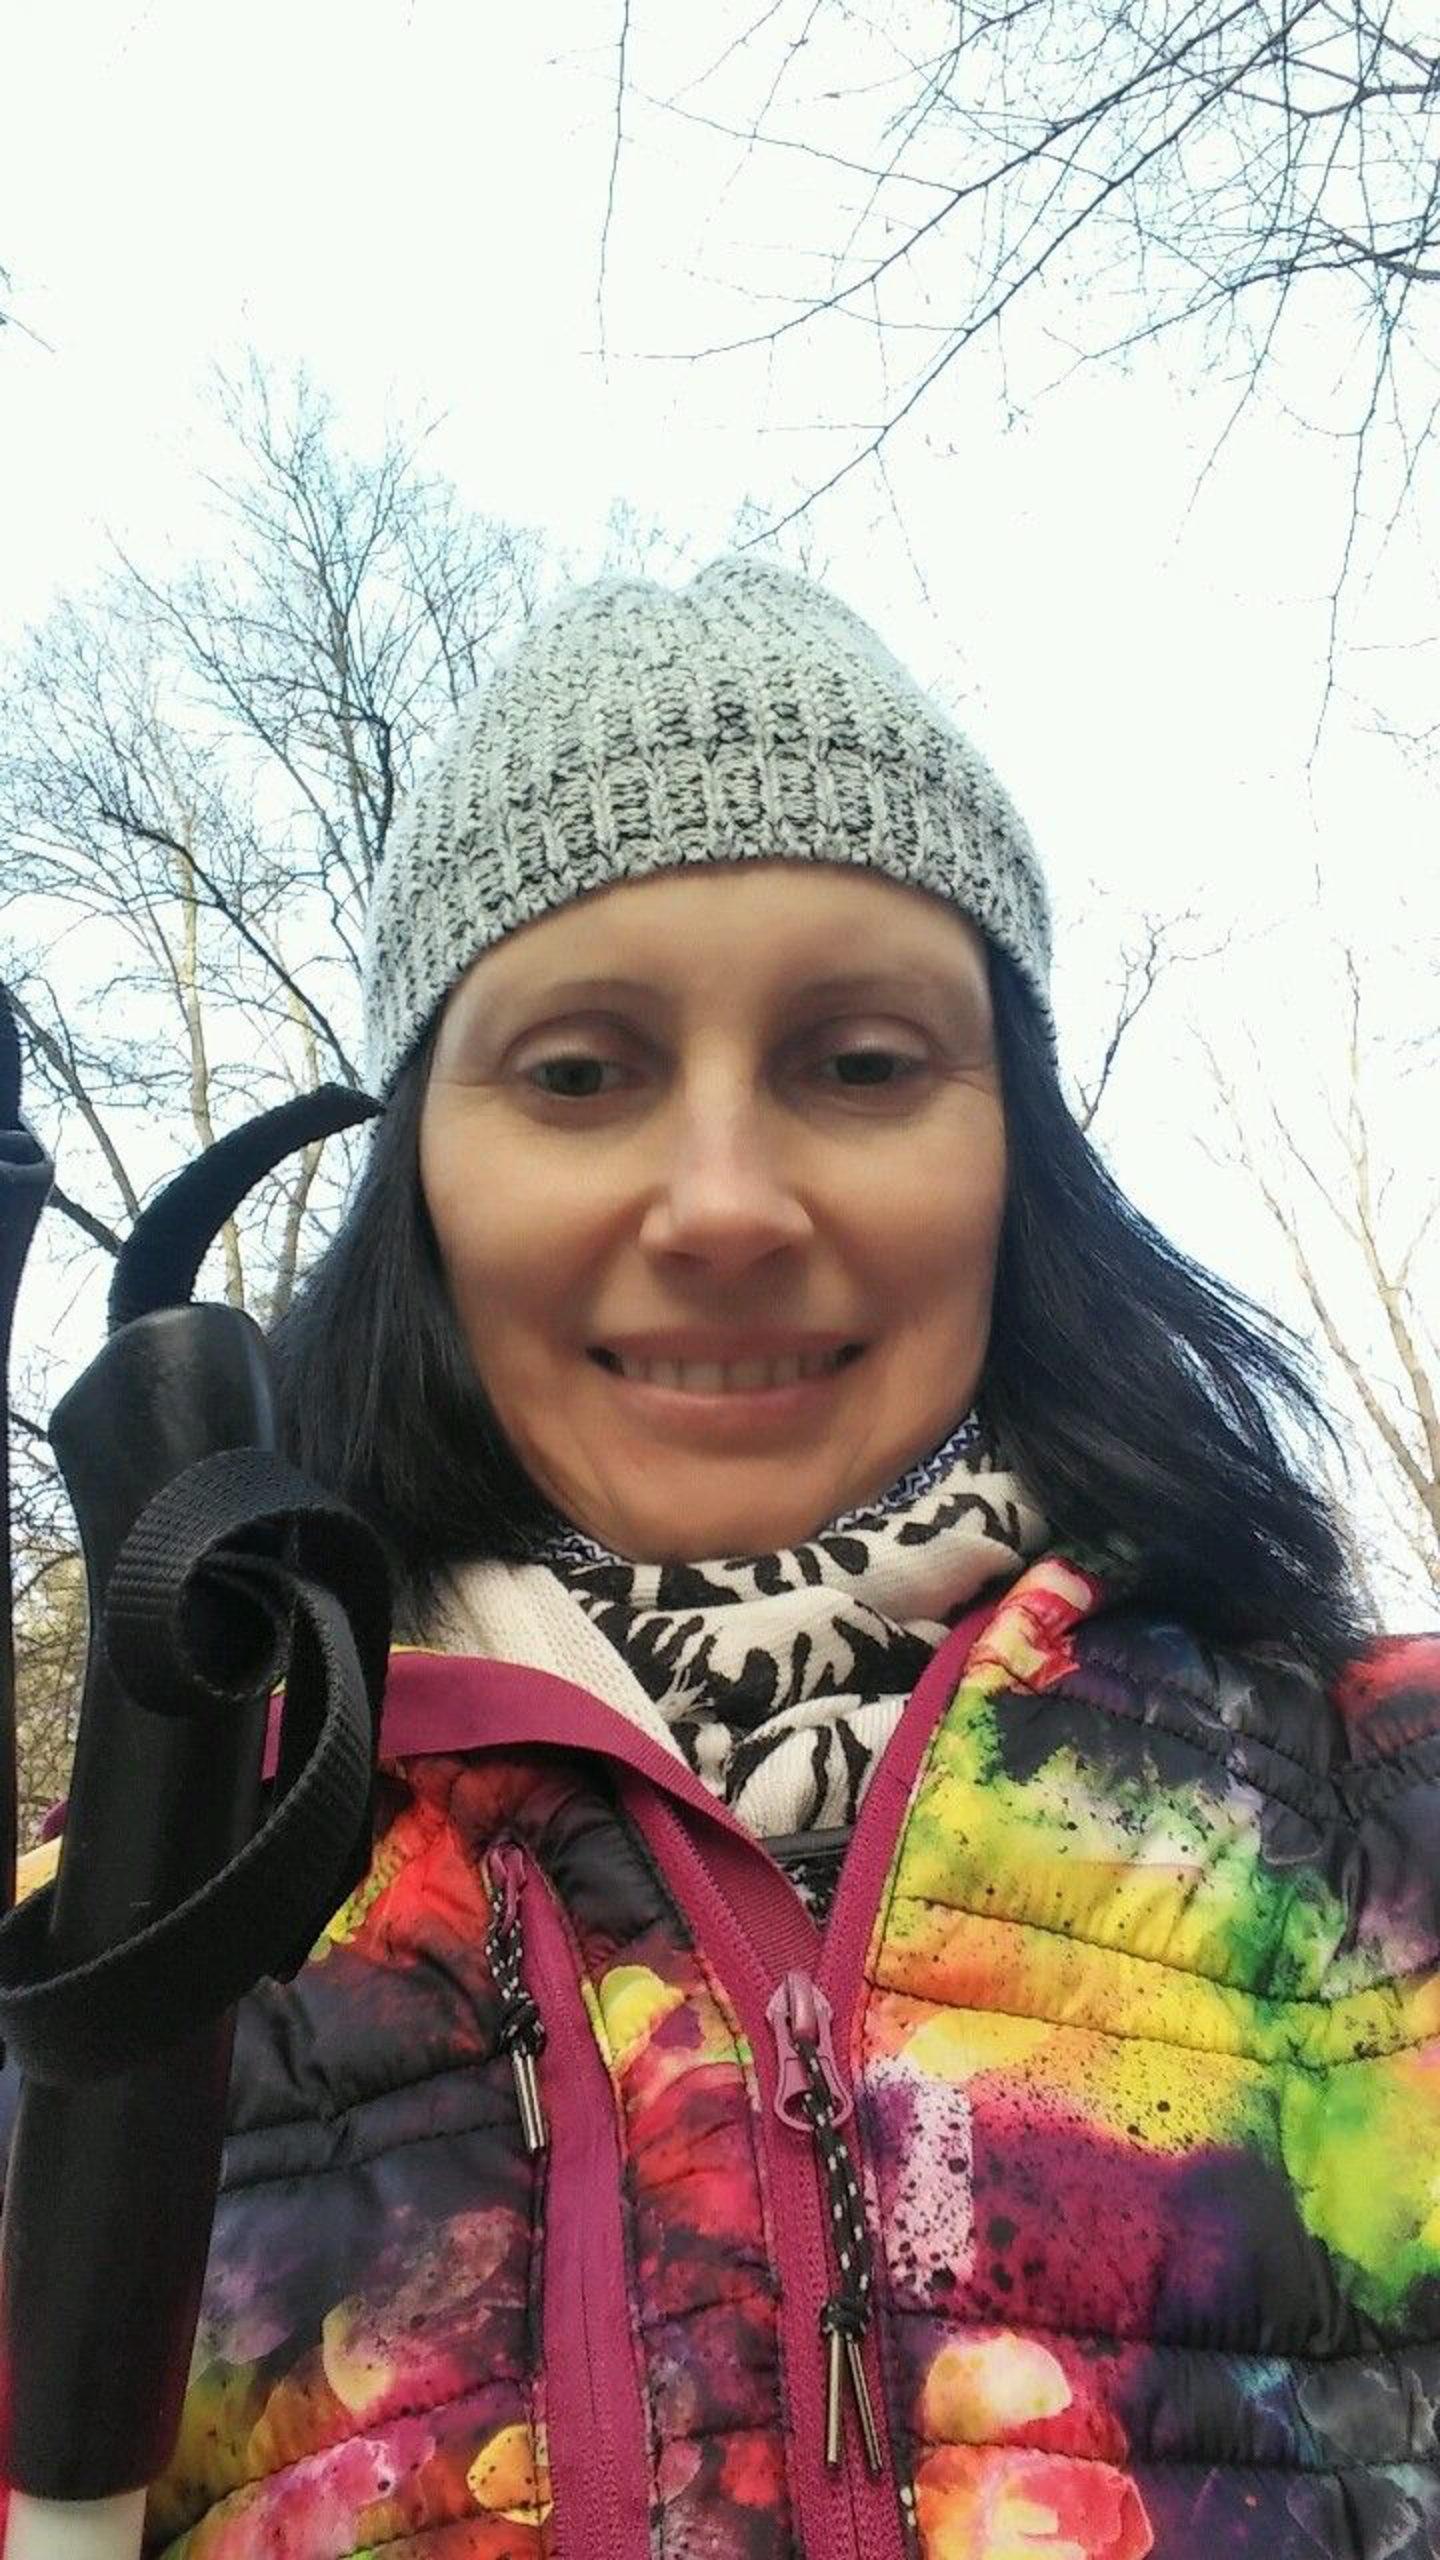 violetta wróblewska, selfij